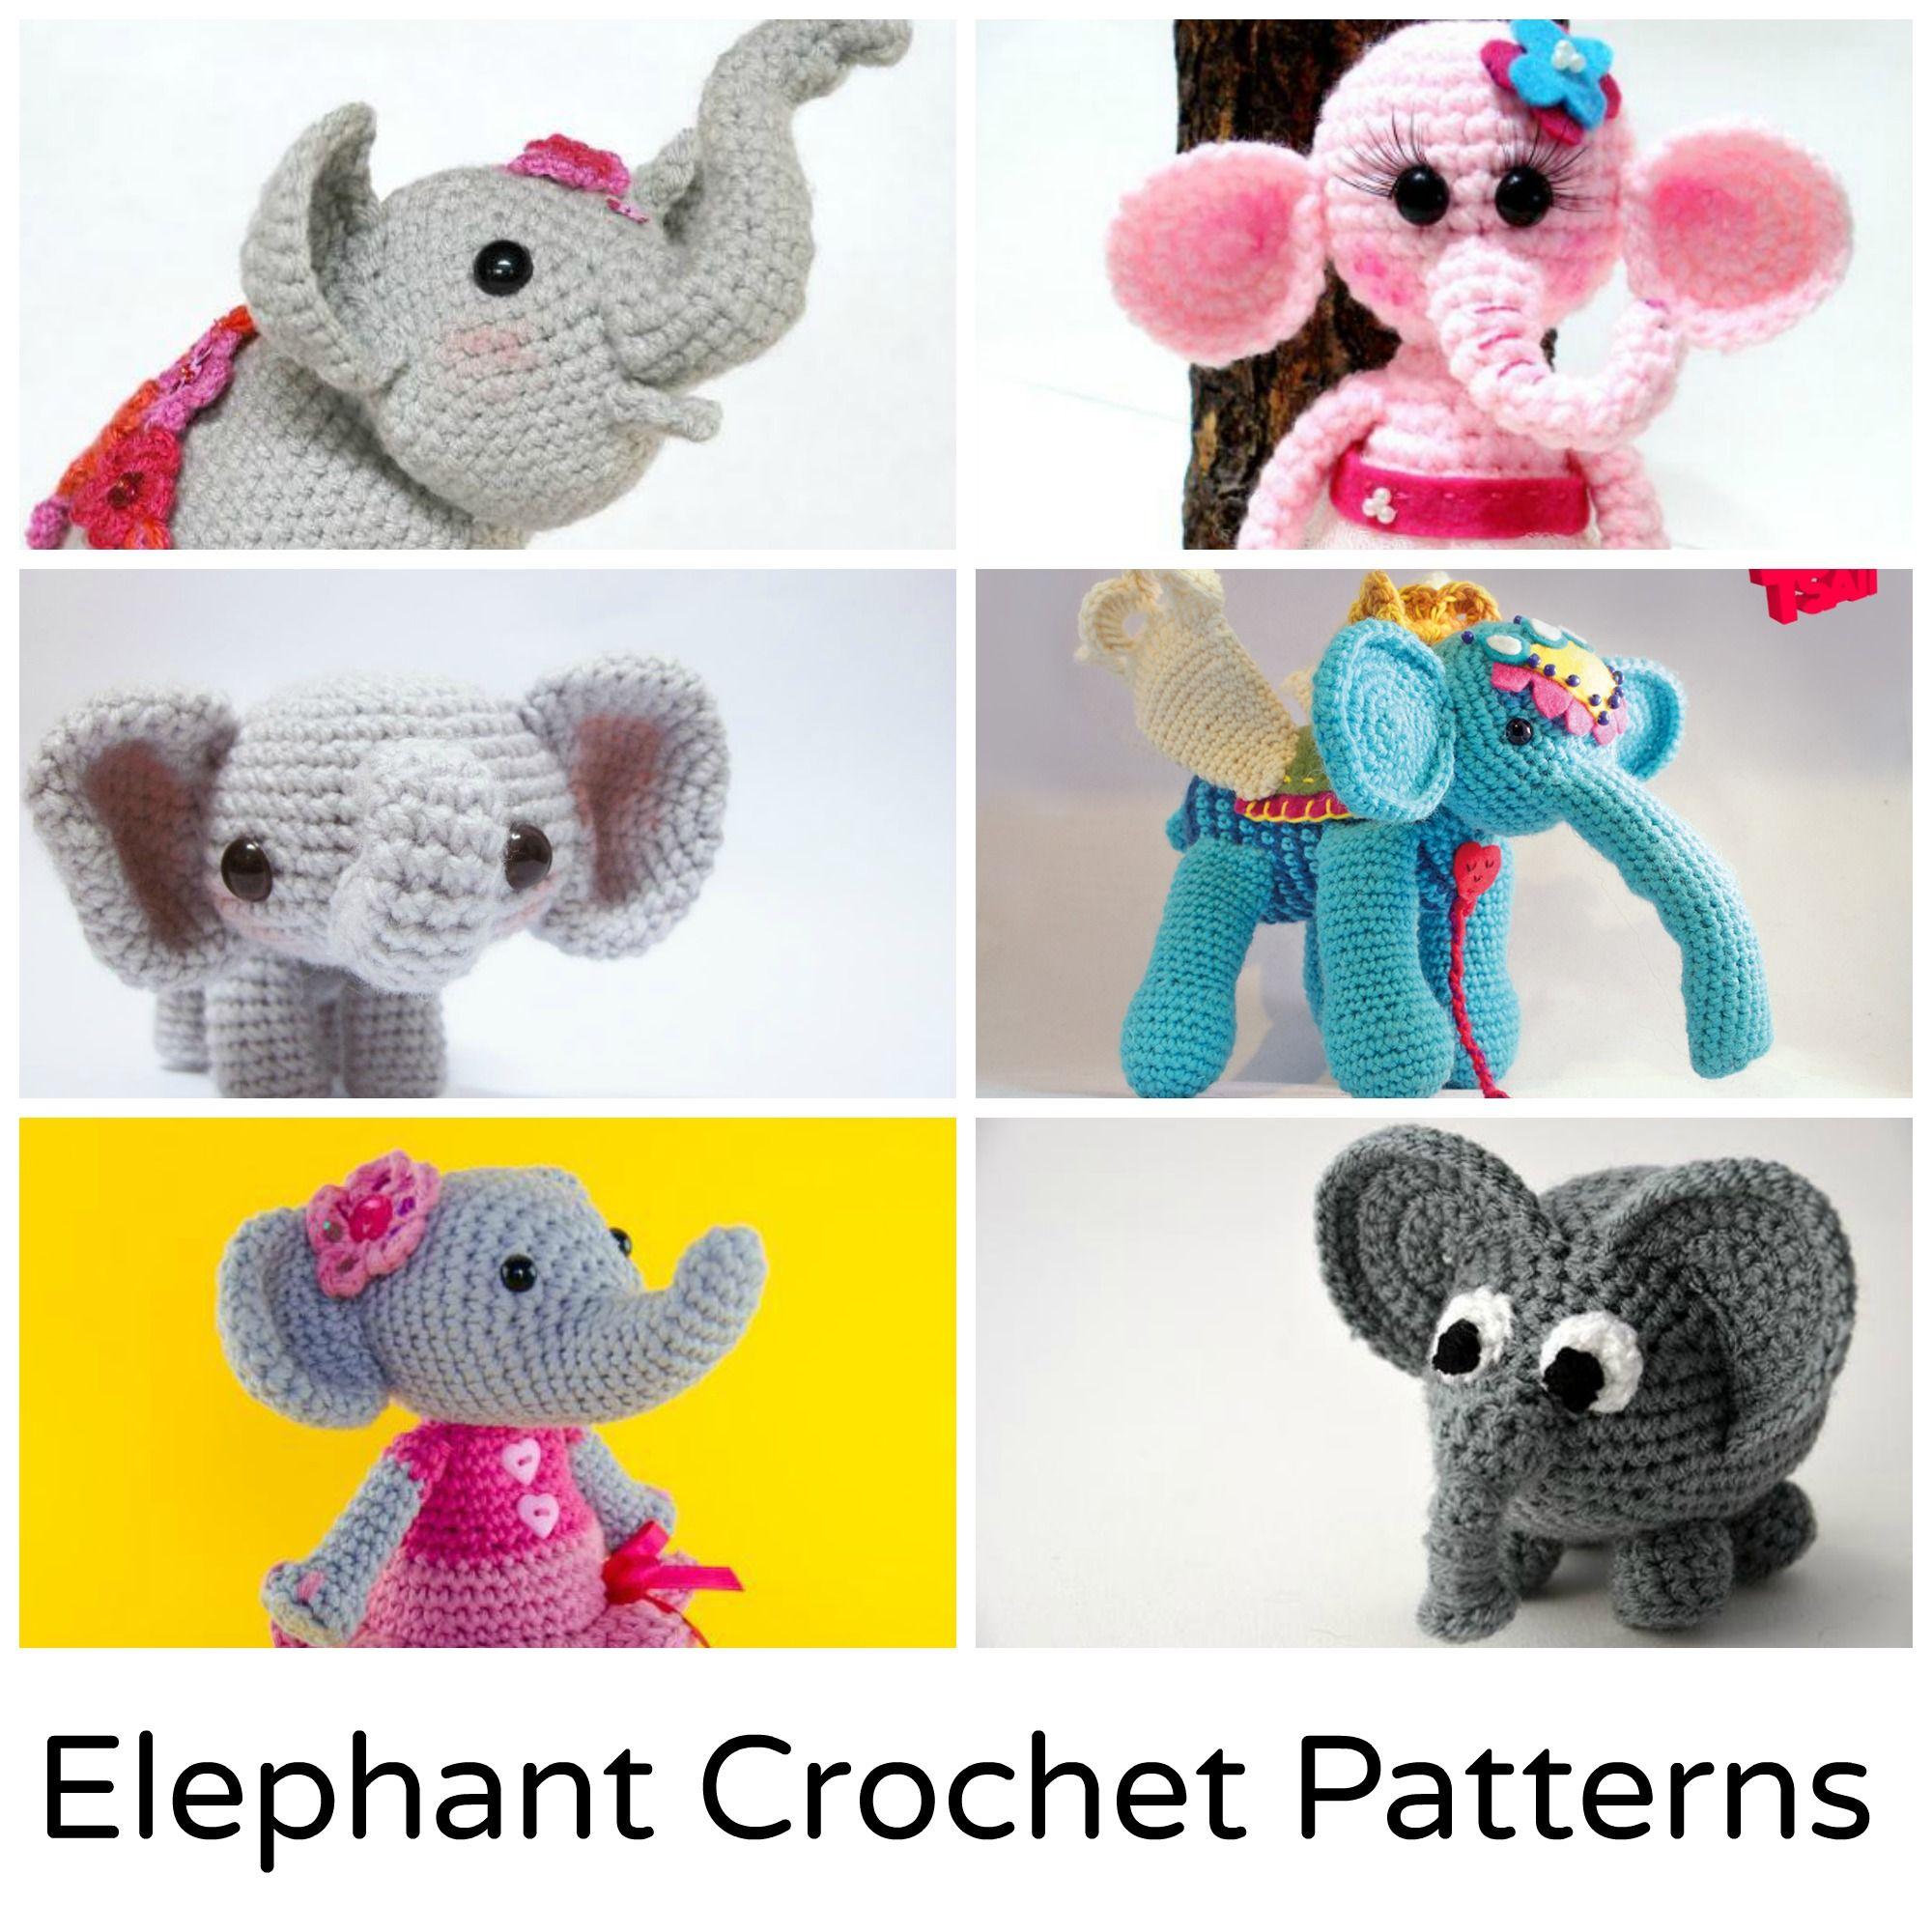 Crochet Elephant: 12 Amigurumi Patterns to Stitch | Ganchillo y Animales